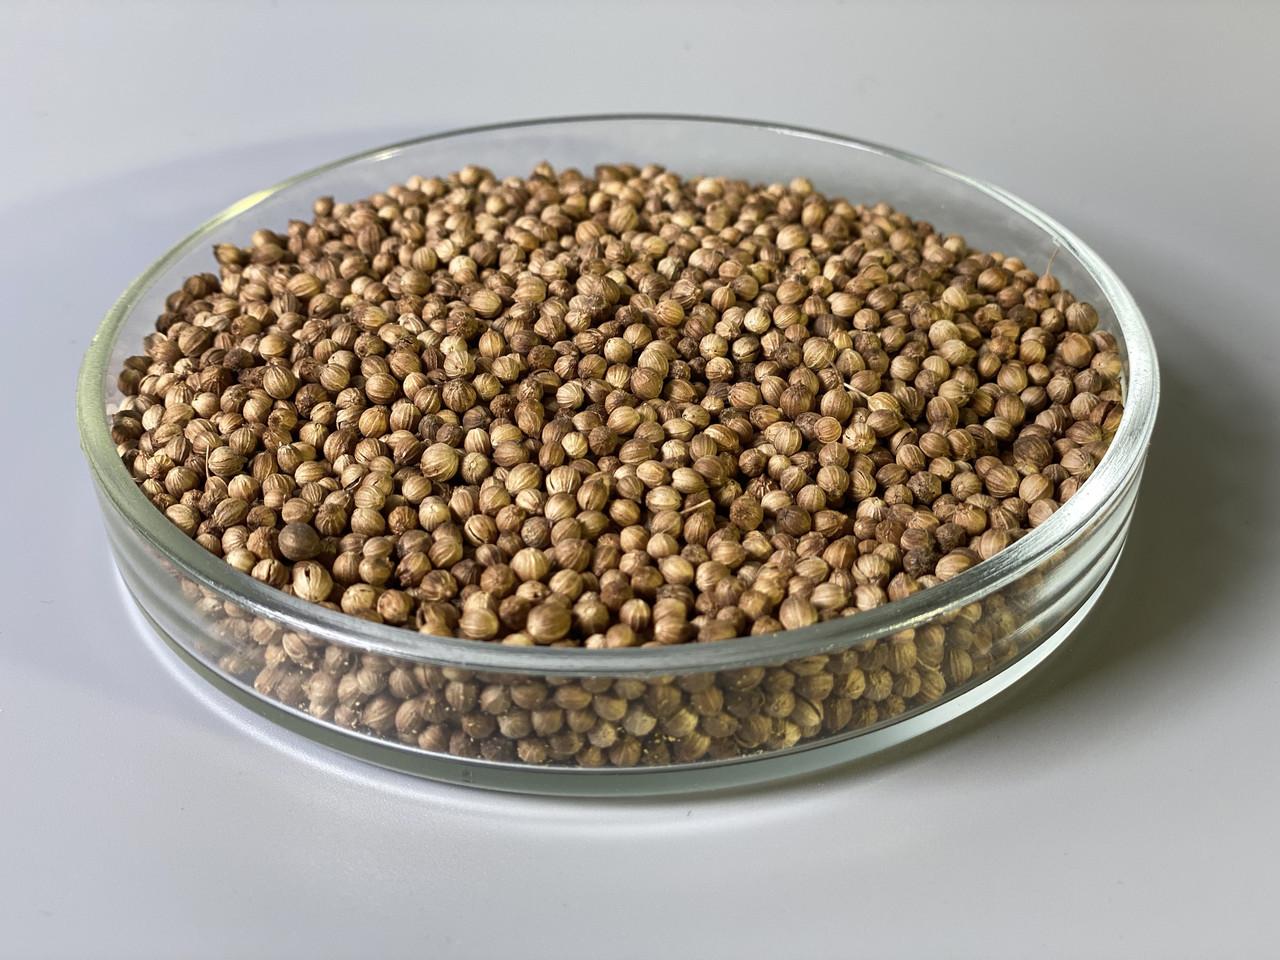 Кориандр семена микрогрин экосемена microgreens seeds  non gmo certified Вес 1 кг